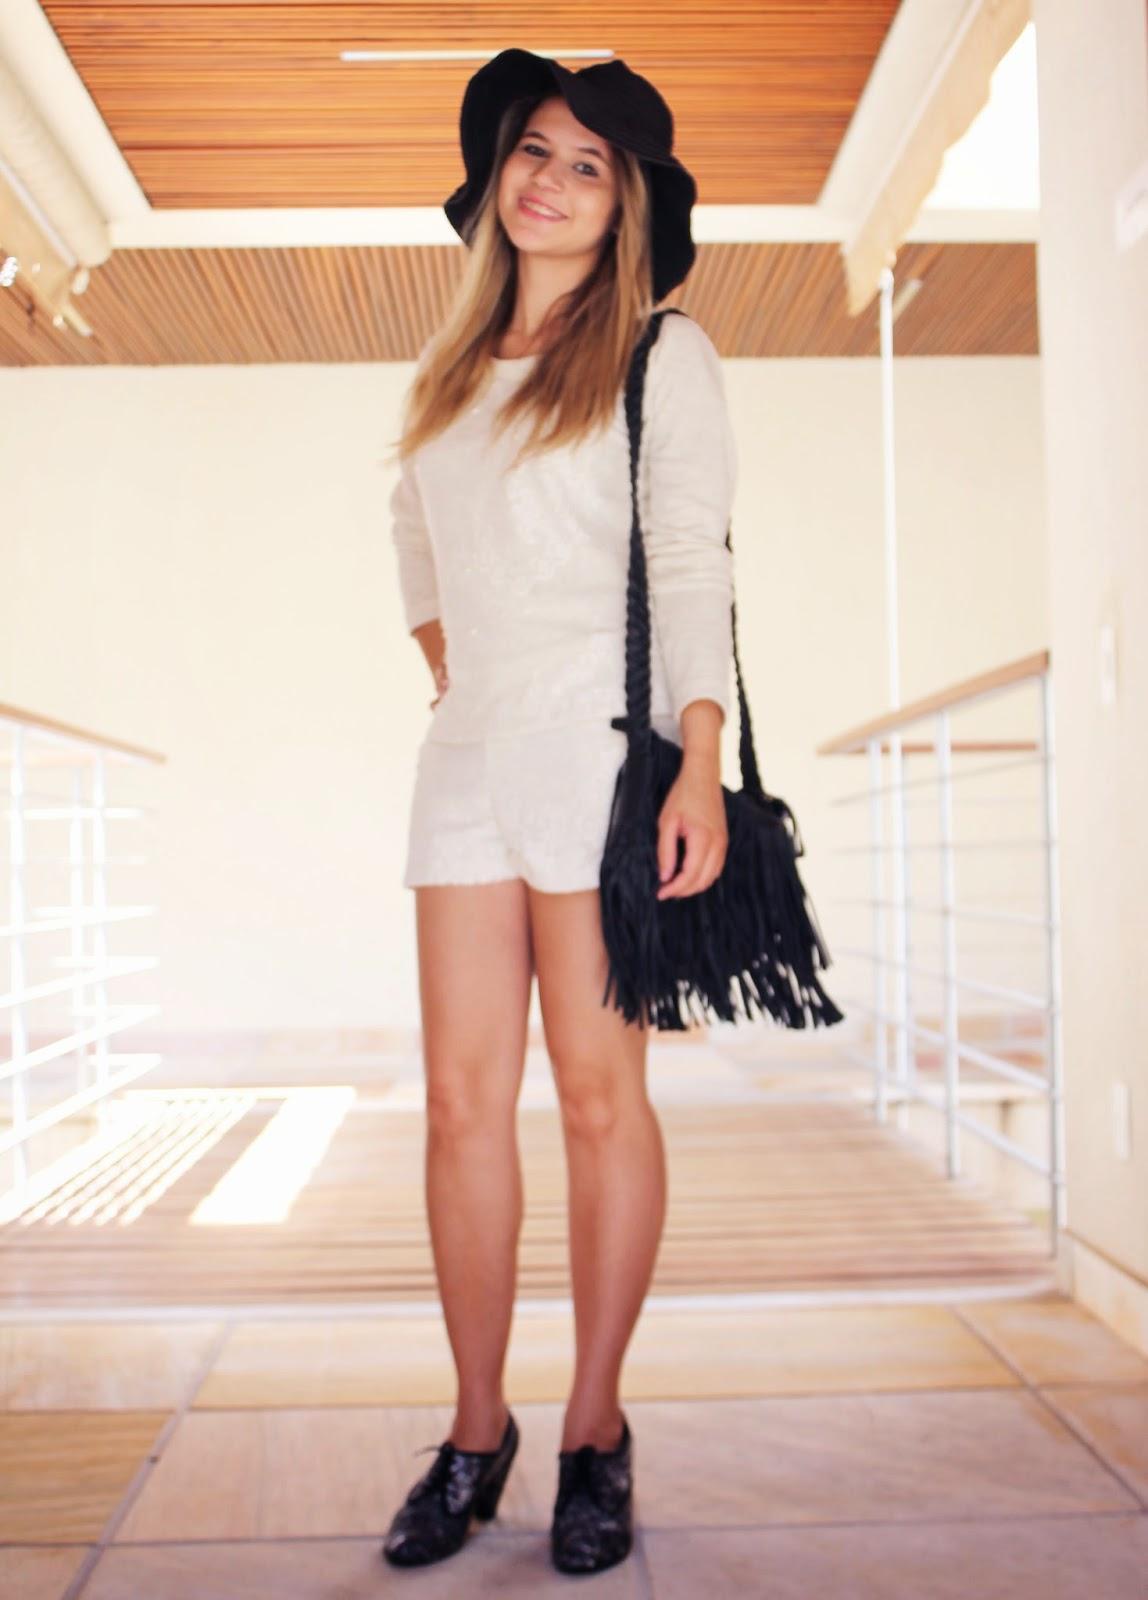 Blog de moda - Belo Horizonte - Bárbara Olimpia